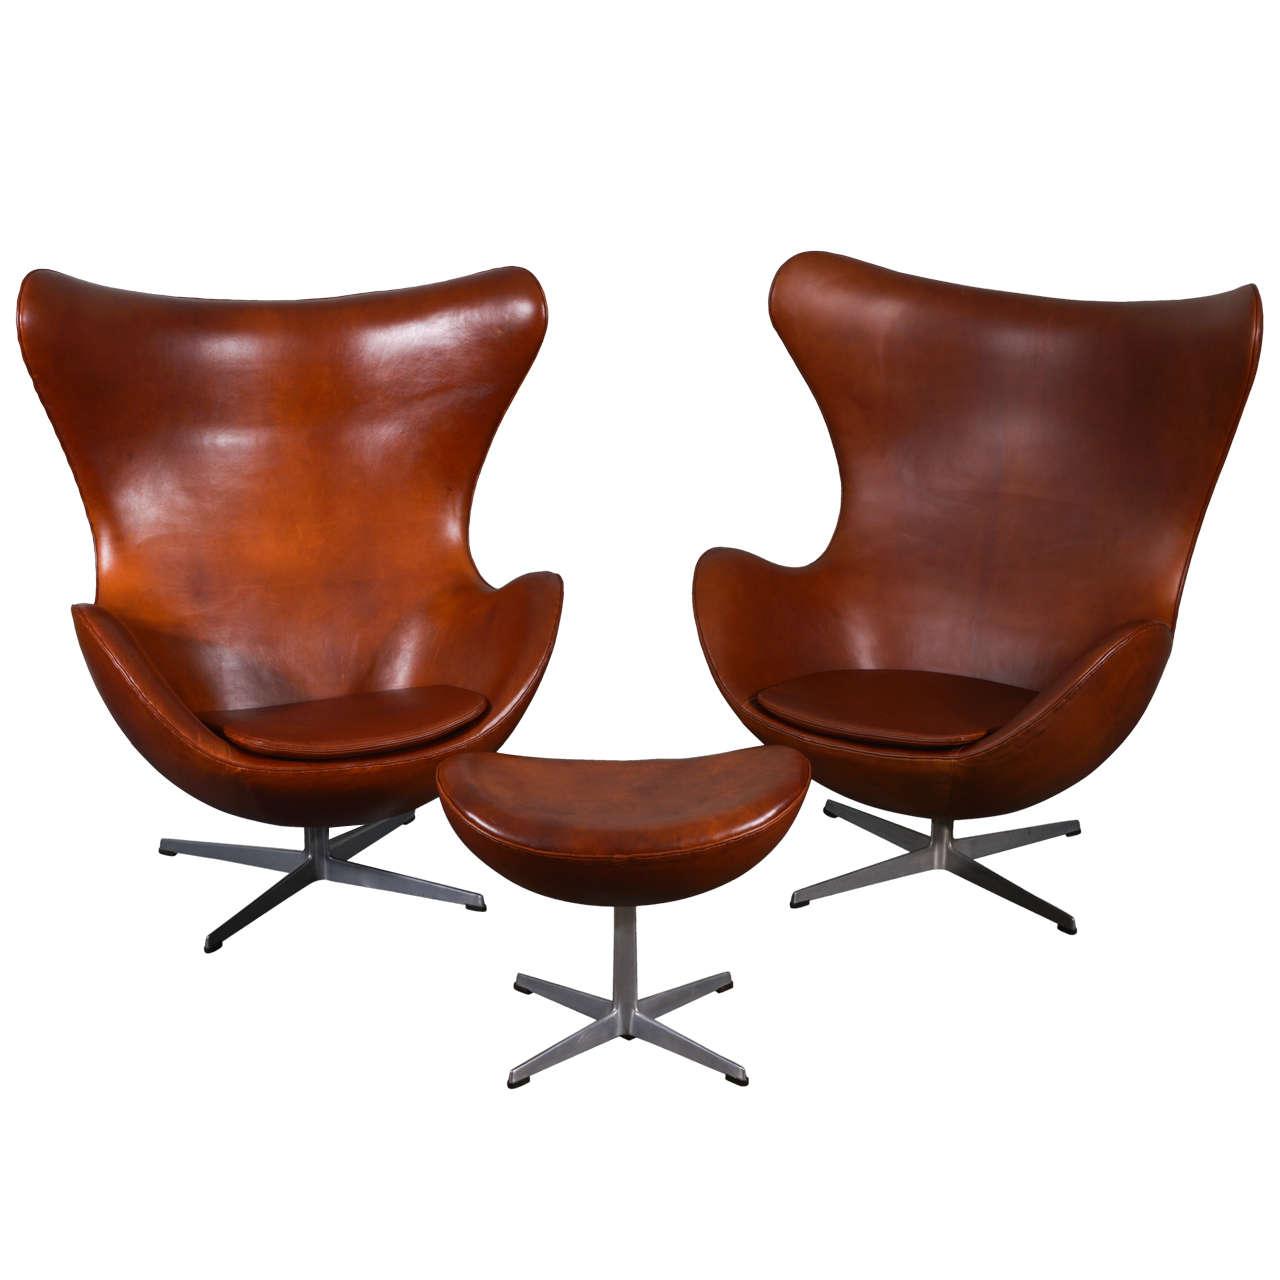 arne jacobsen egg chair and ottoman at 1stdibs. Black Bedroom Furniture Sets. Home Design Ideas